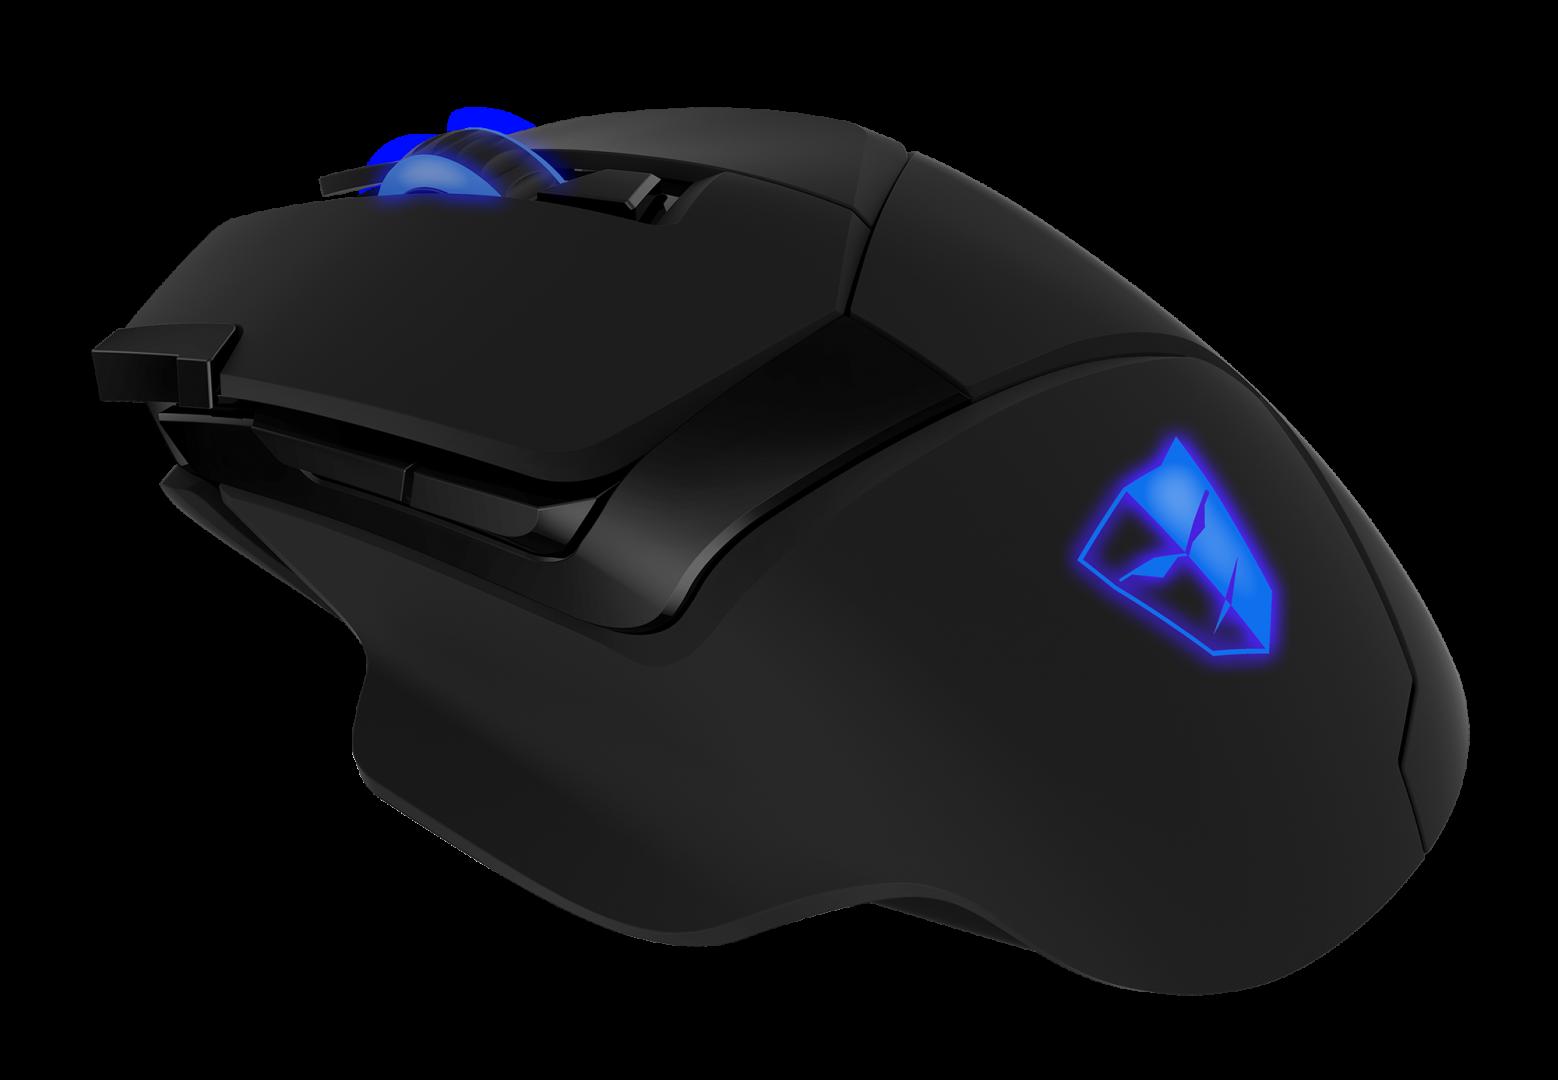 TESORO Launches Advanced Ascalon H7L Infrared Optical Sensor Gaming Mouse